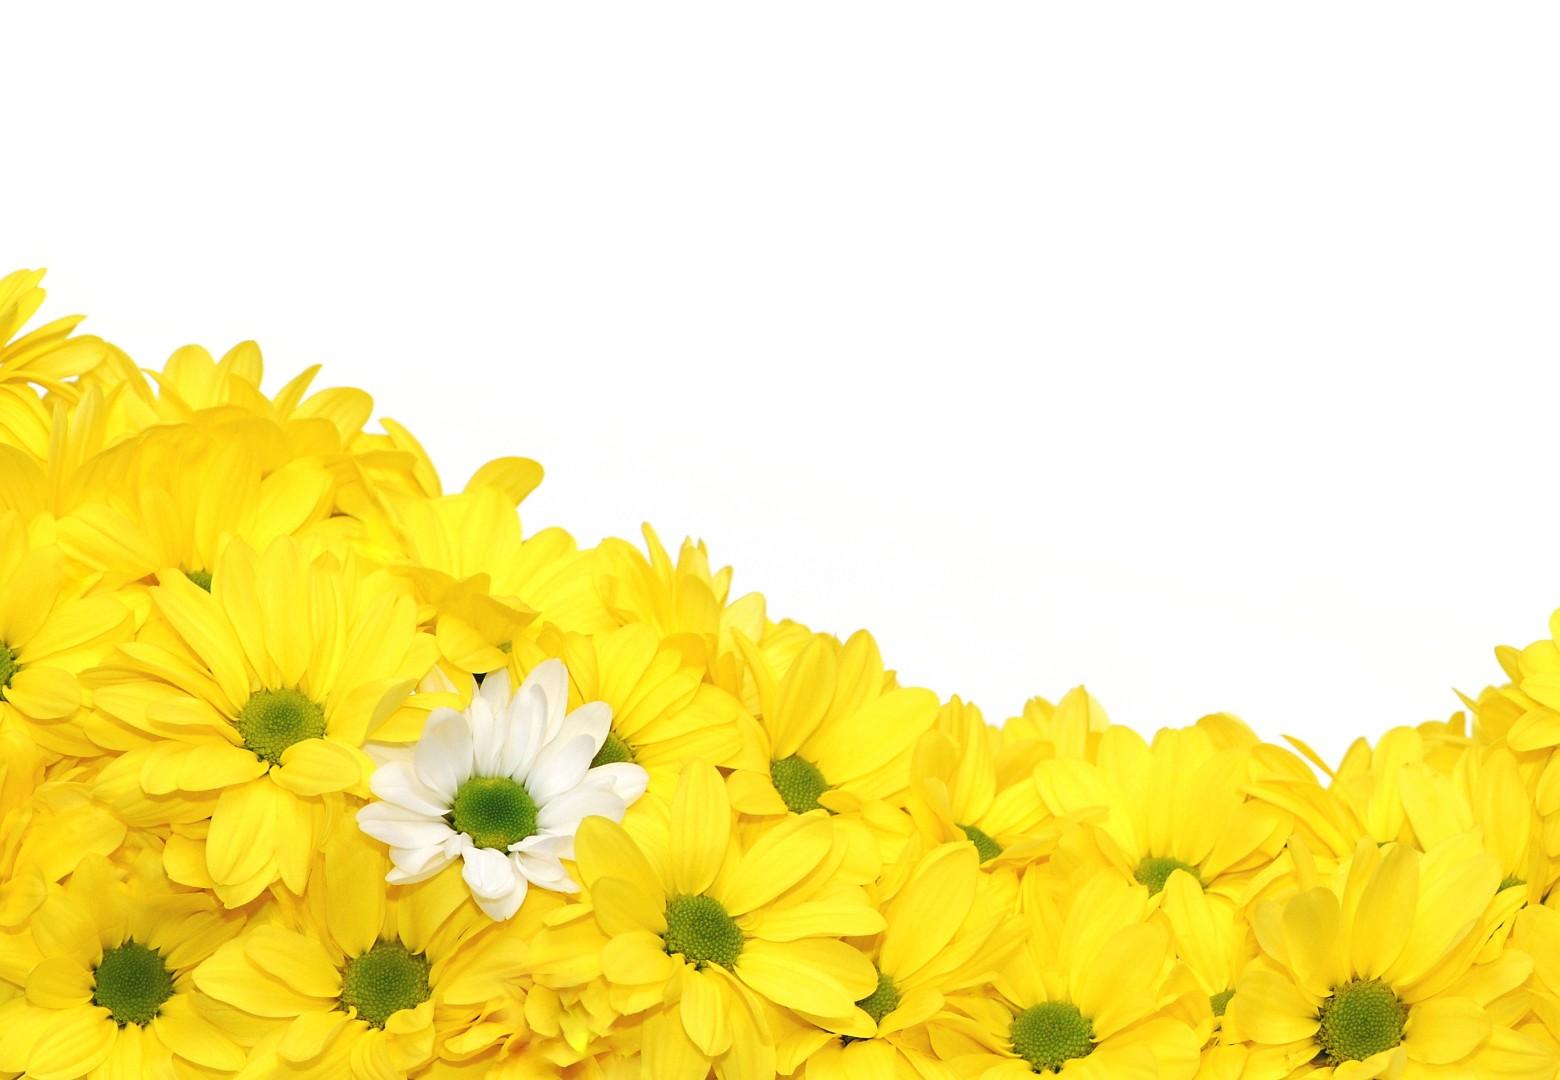 fleurs jaune fond blanc. Black Bedroom Furniture Sets. Home Design Ideas